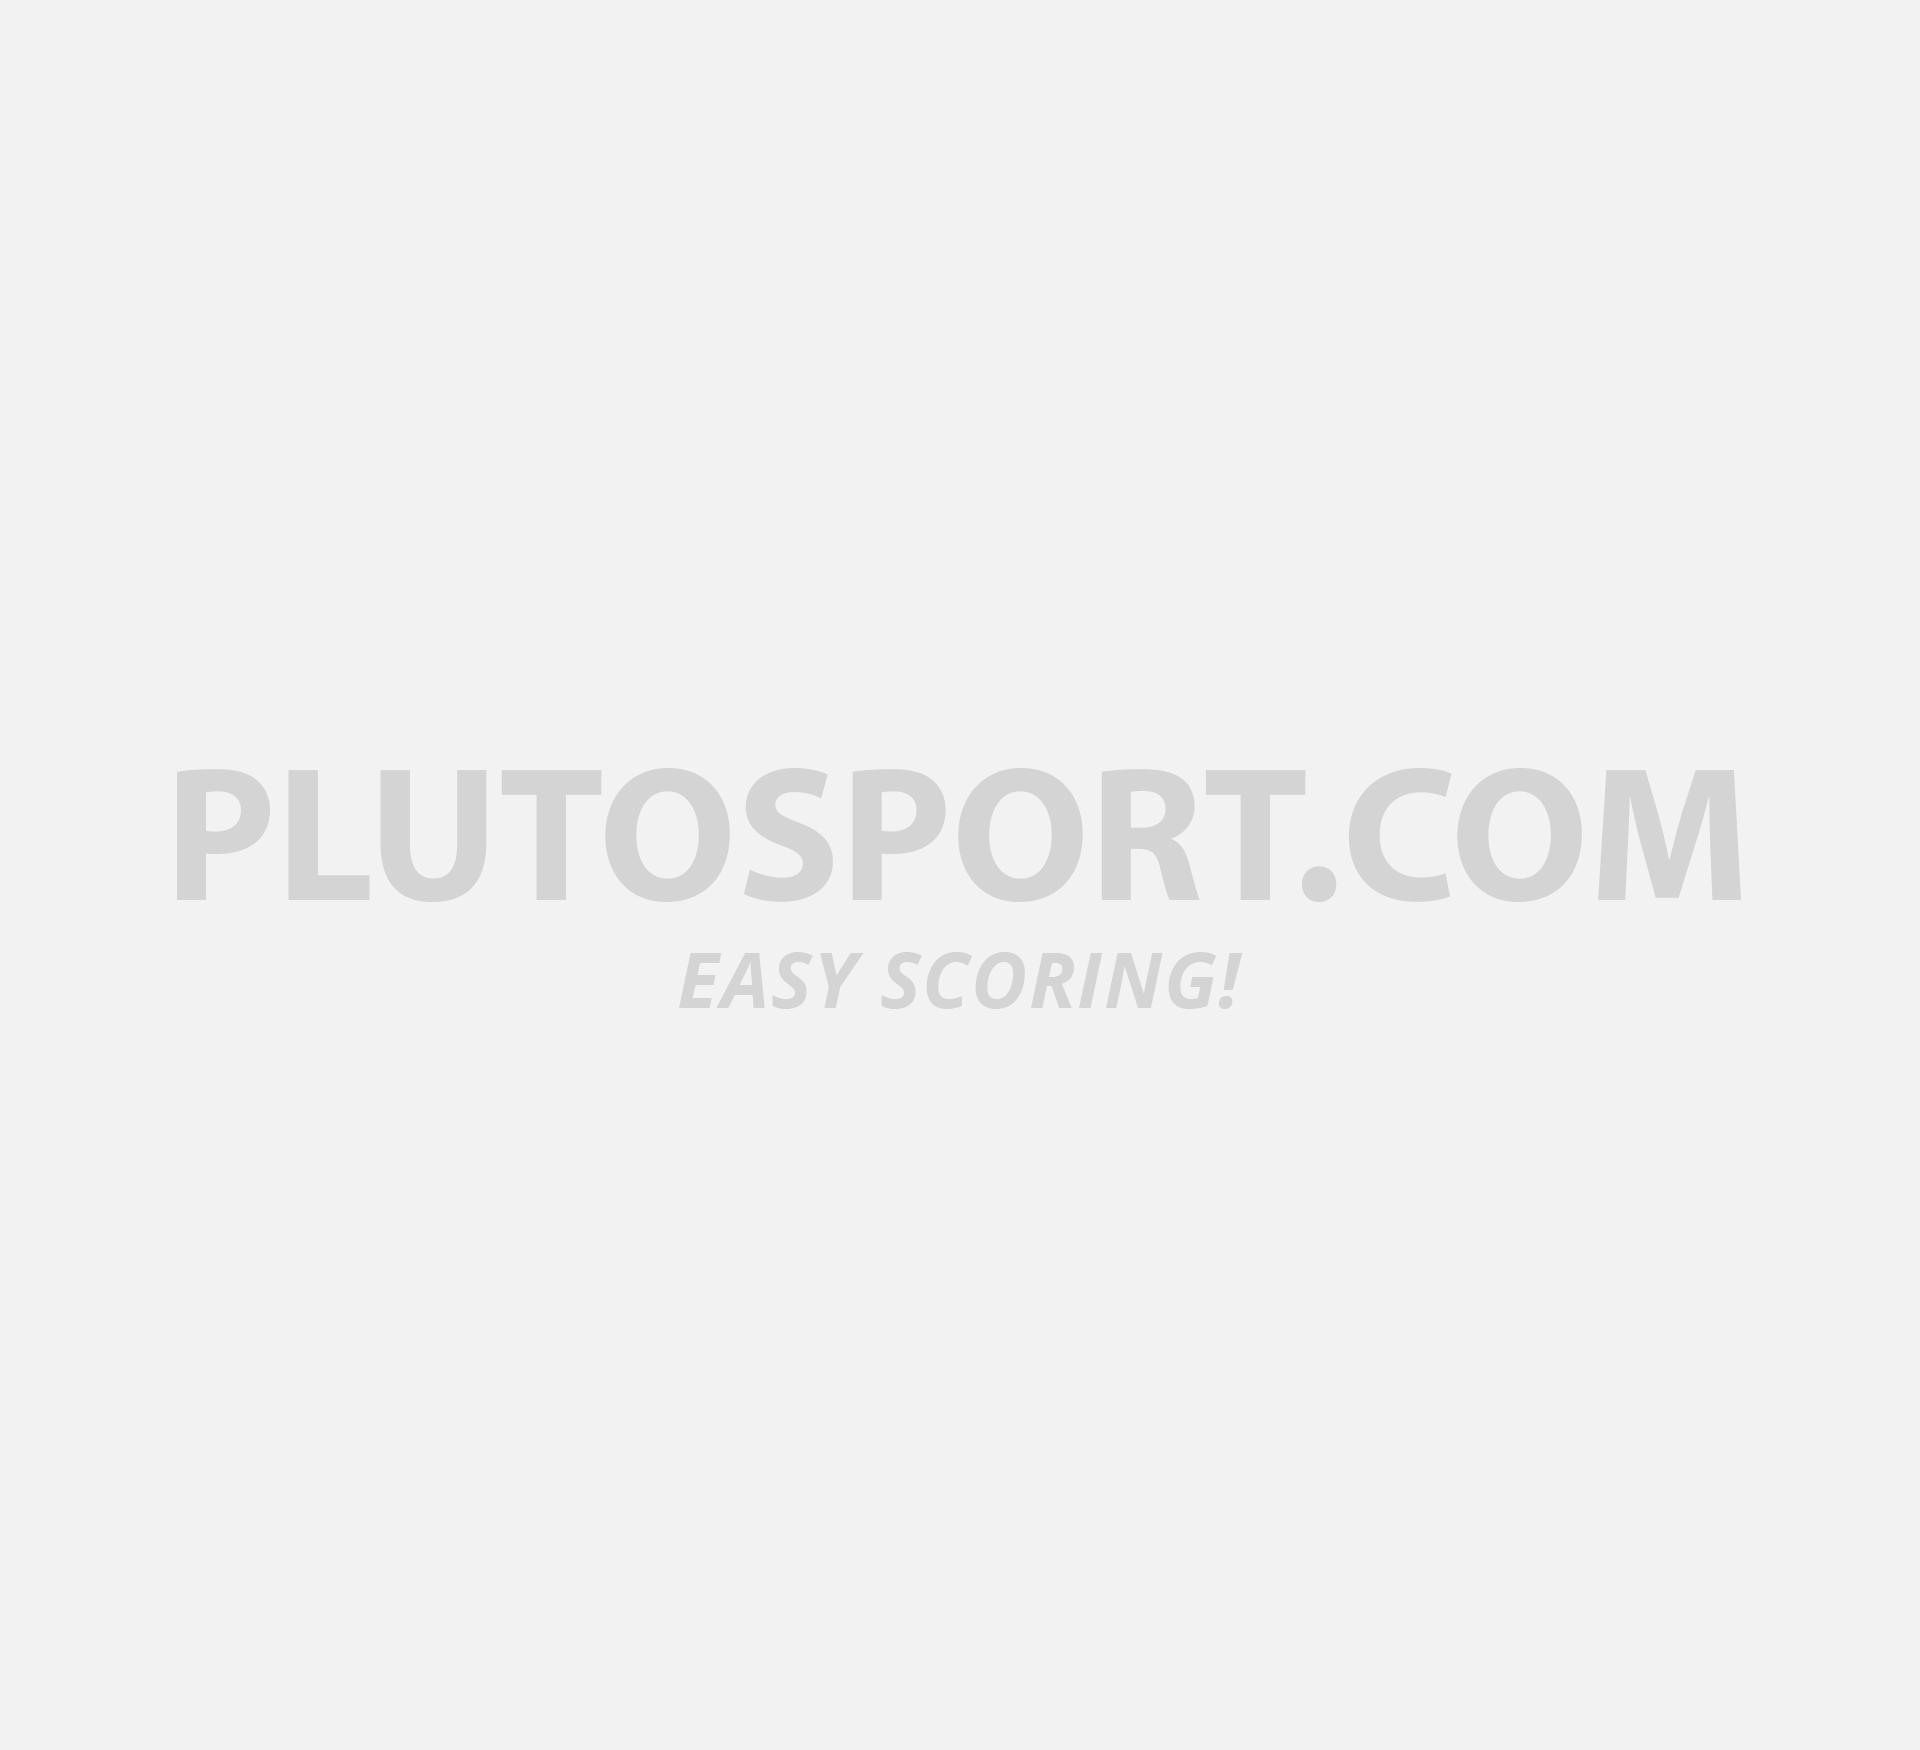 00af746e2ee Puma Vikky Platform Ribbon S W - Sneakers - Shoes - Lifestyle - Sports |  Plutosport